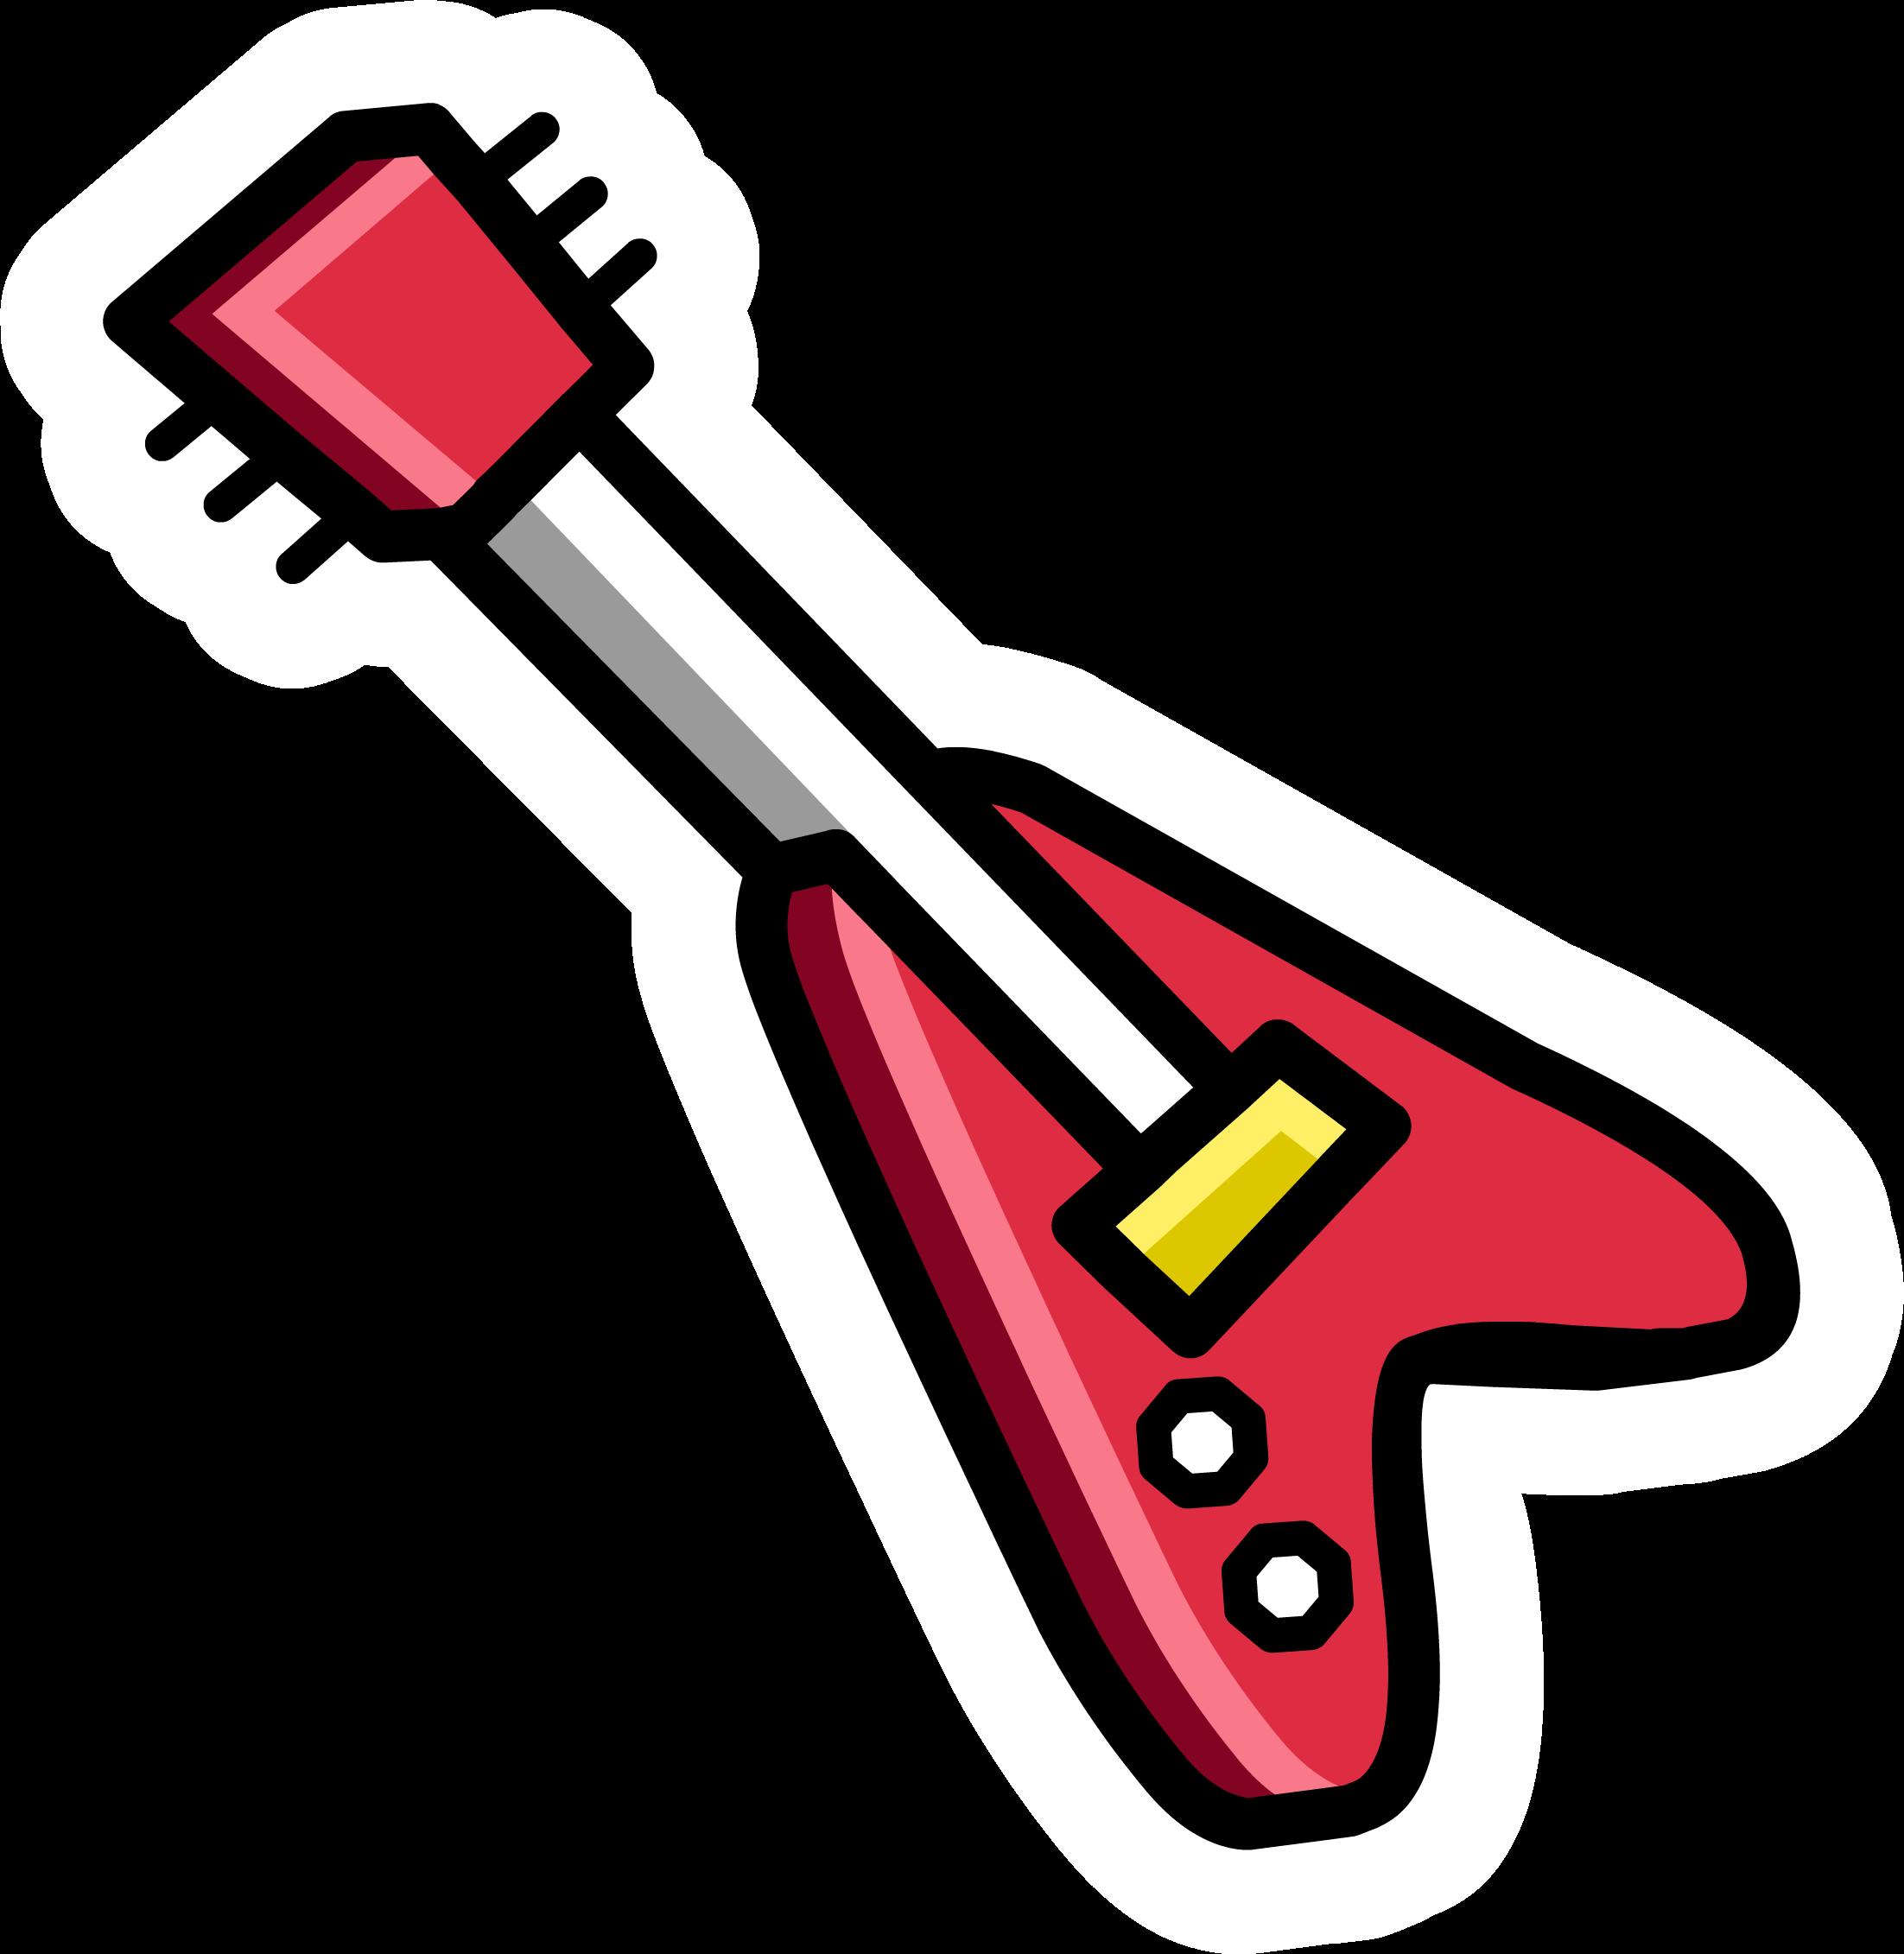 Red Electric Guitar Pin